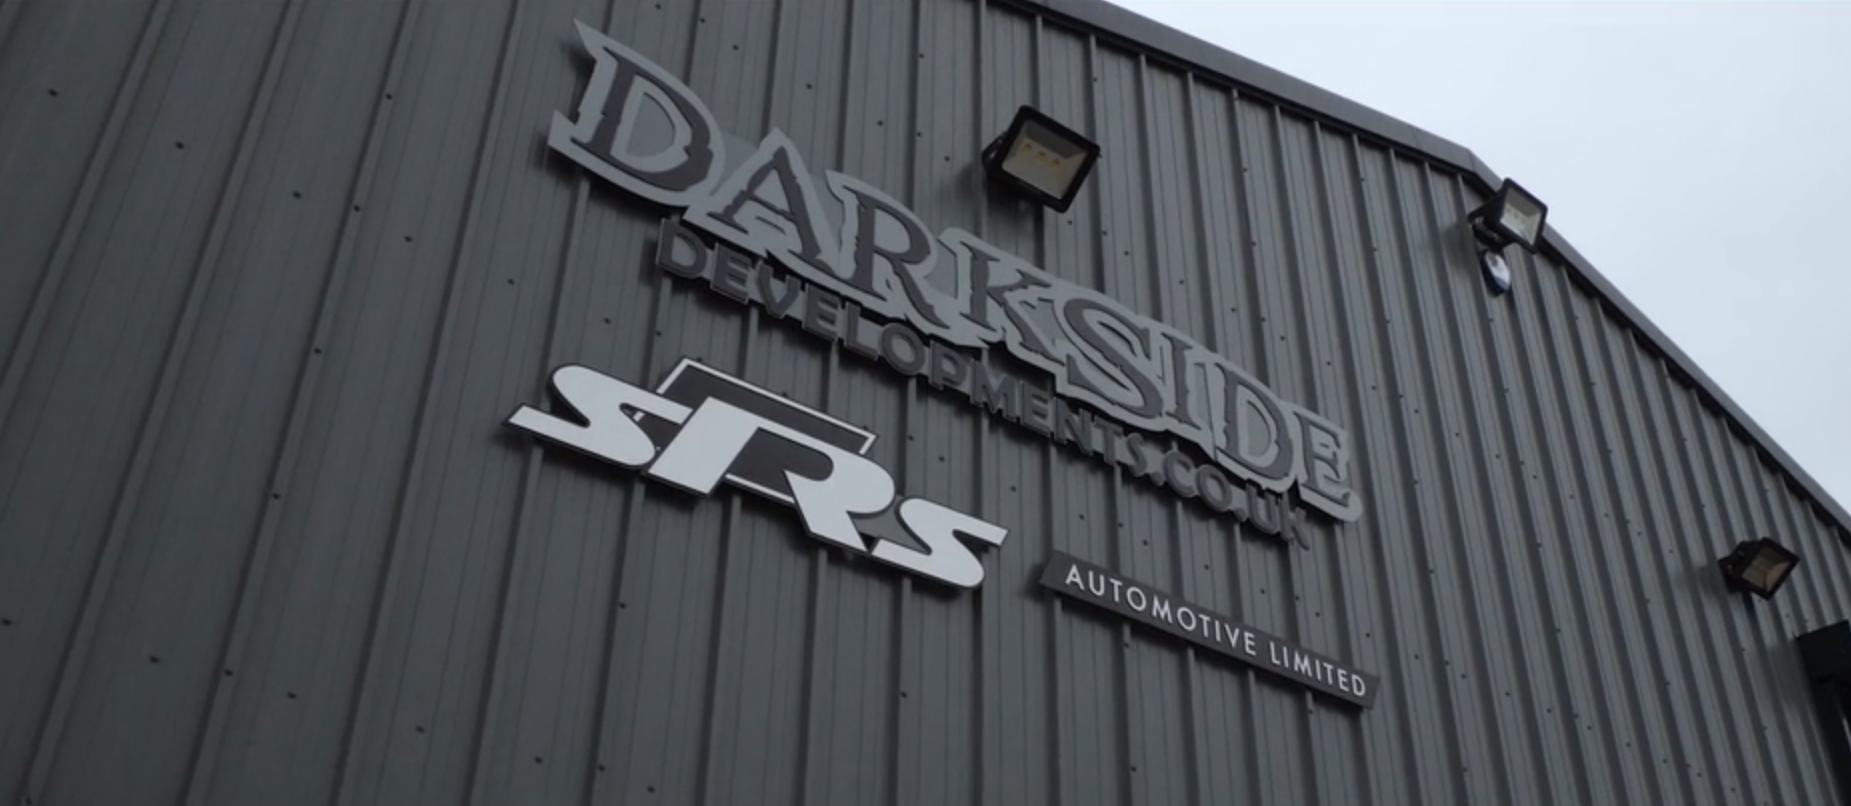 Darkside Developments – Company Profile Video